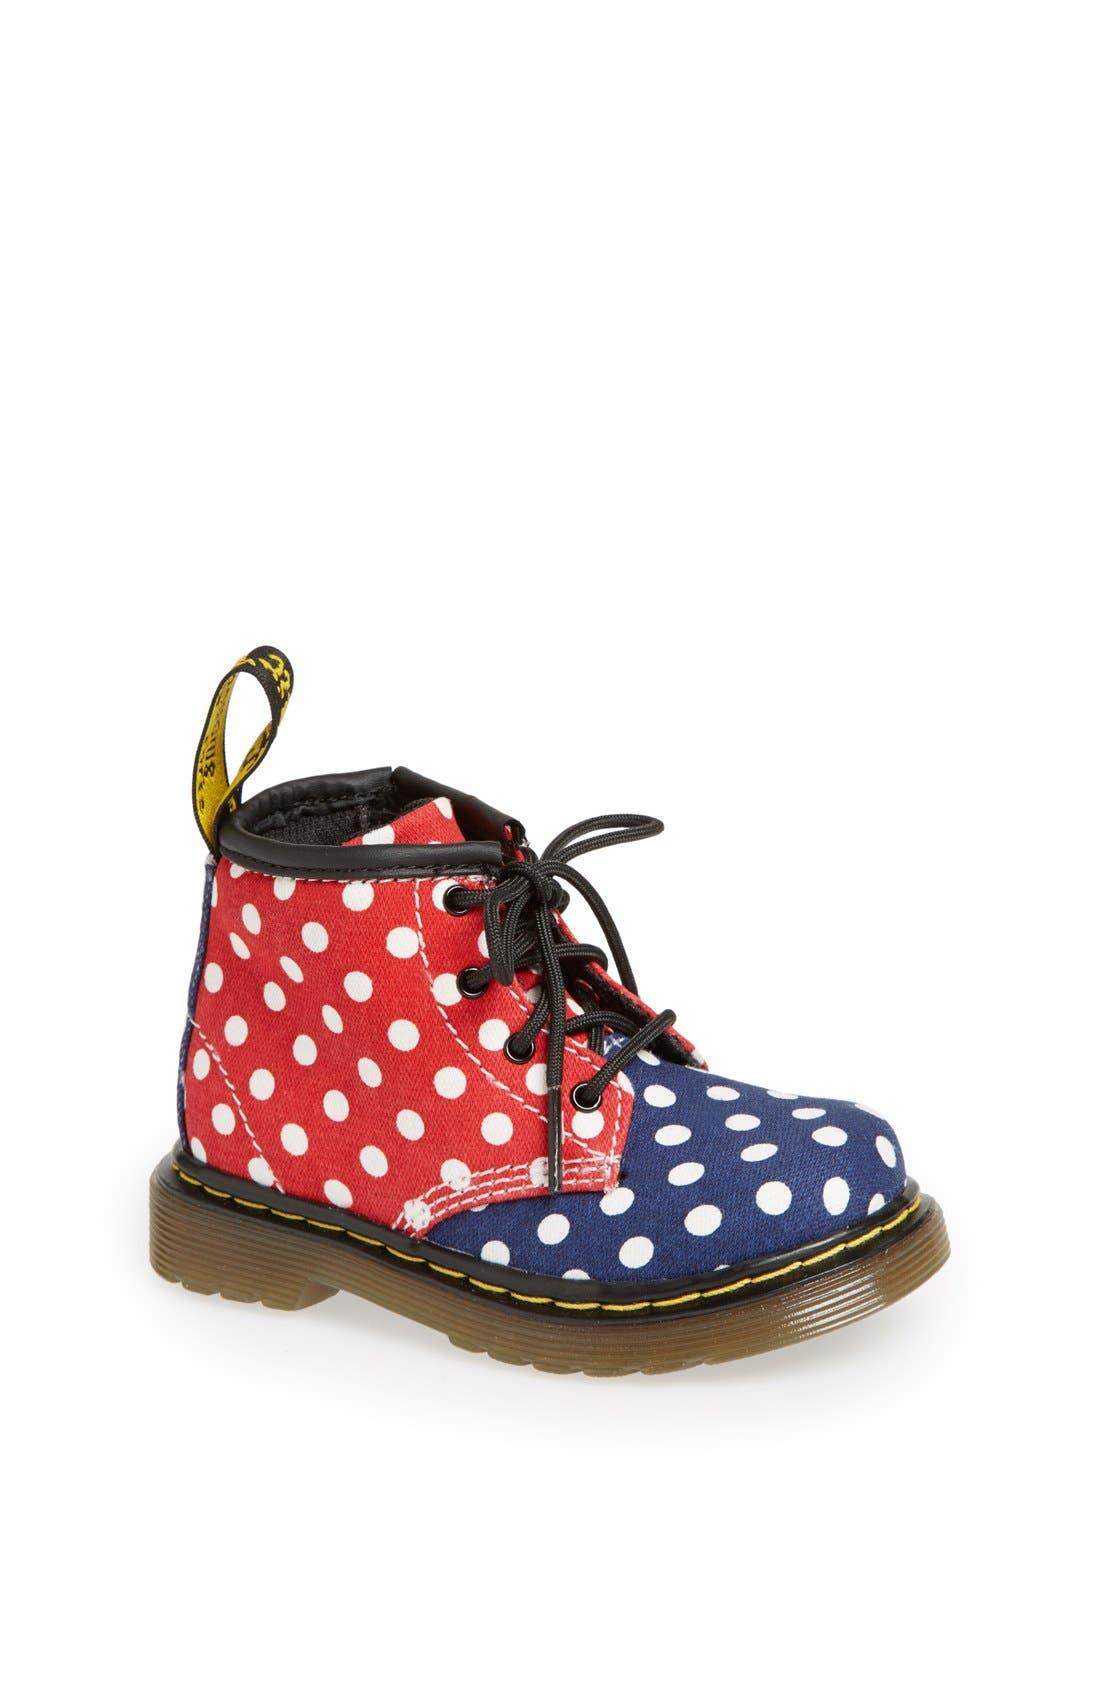 Alternate Image 1 Selected - Dr. Martens 'Brooklee' Boot (Baby & Walker)